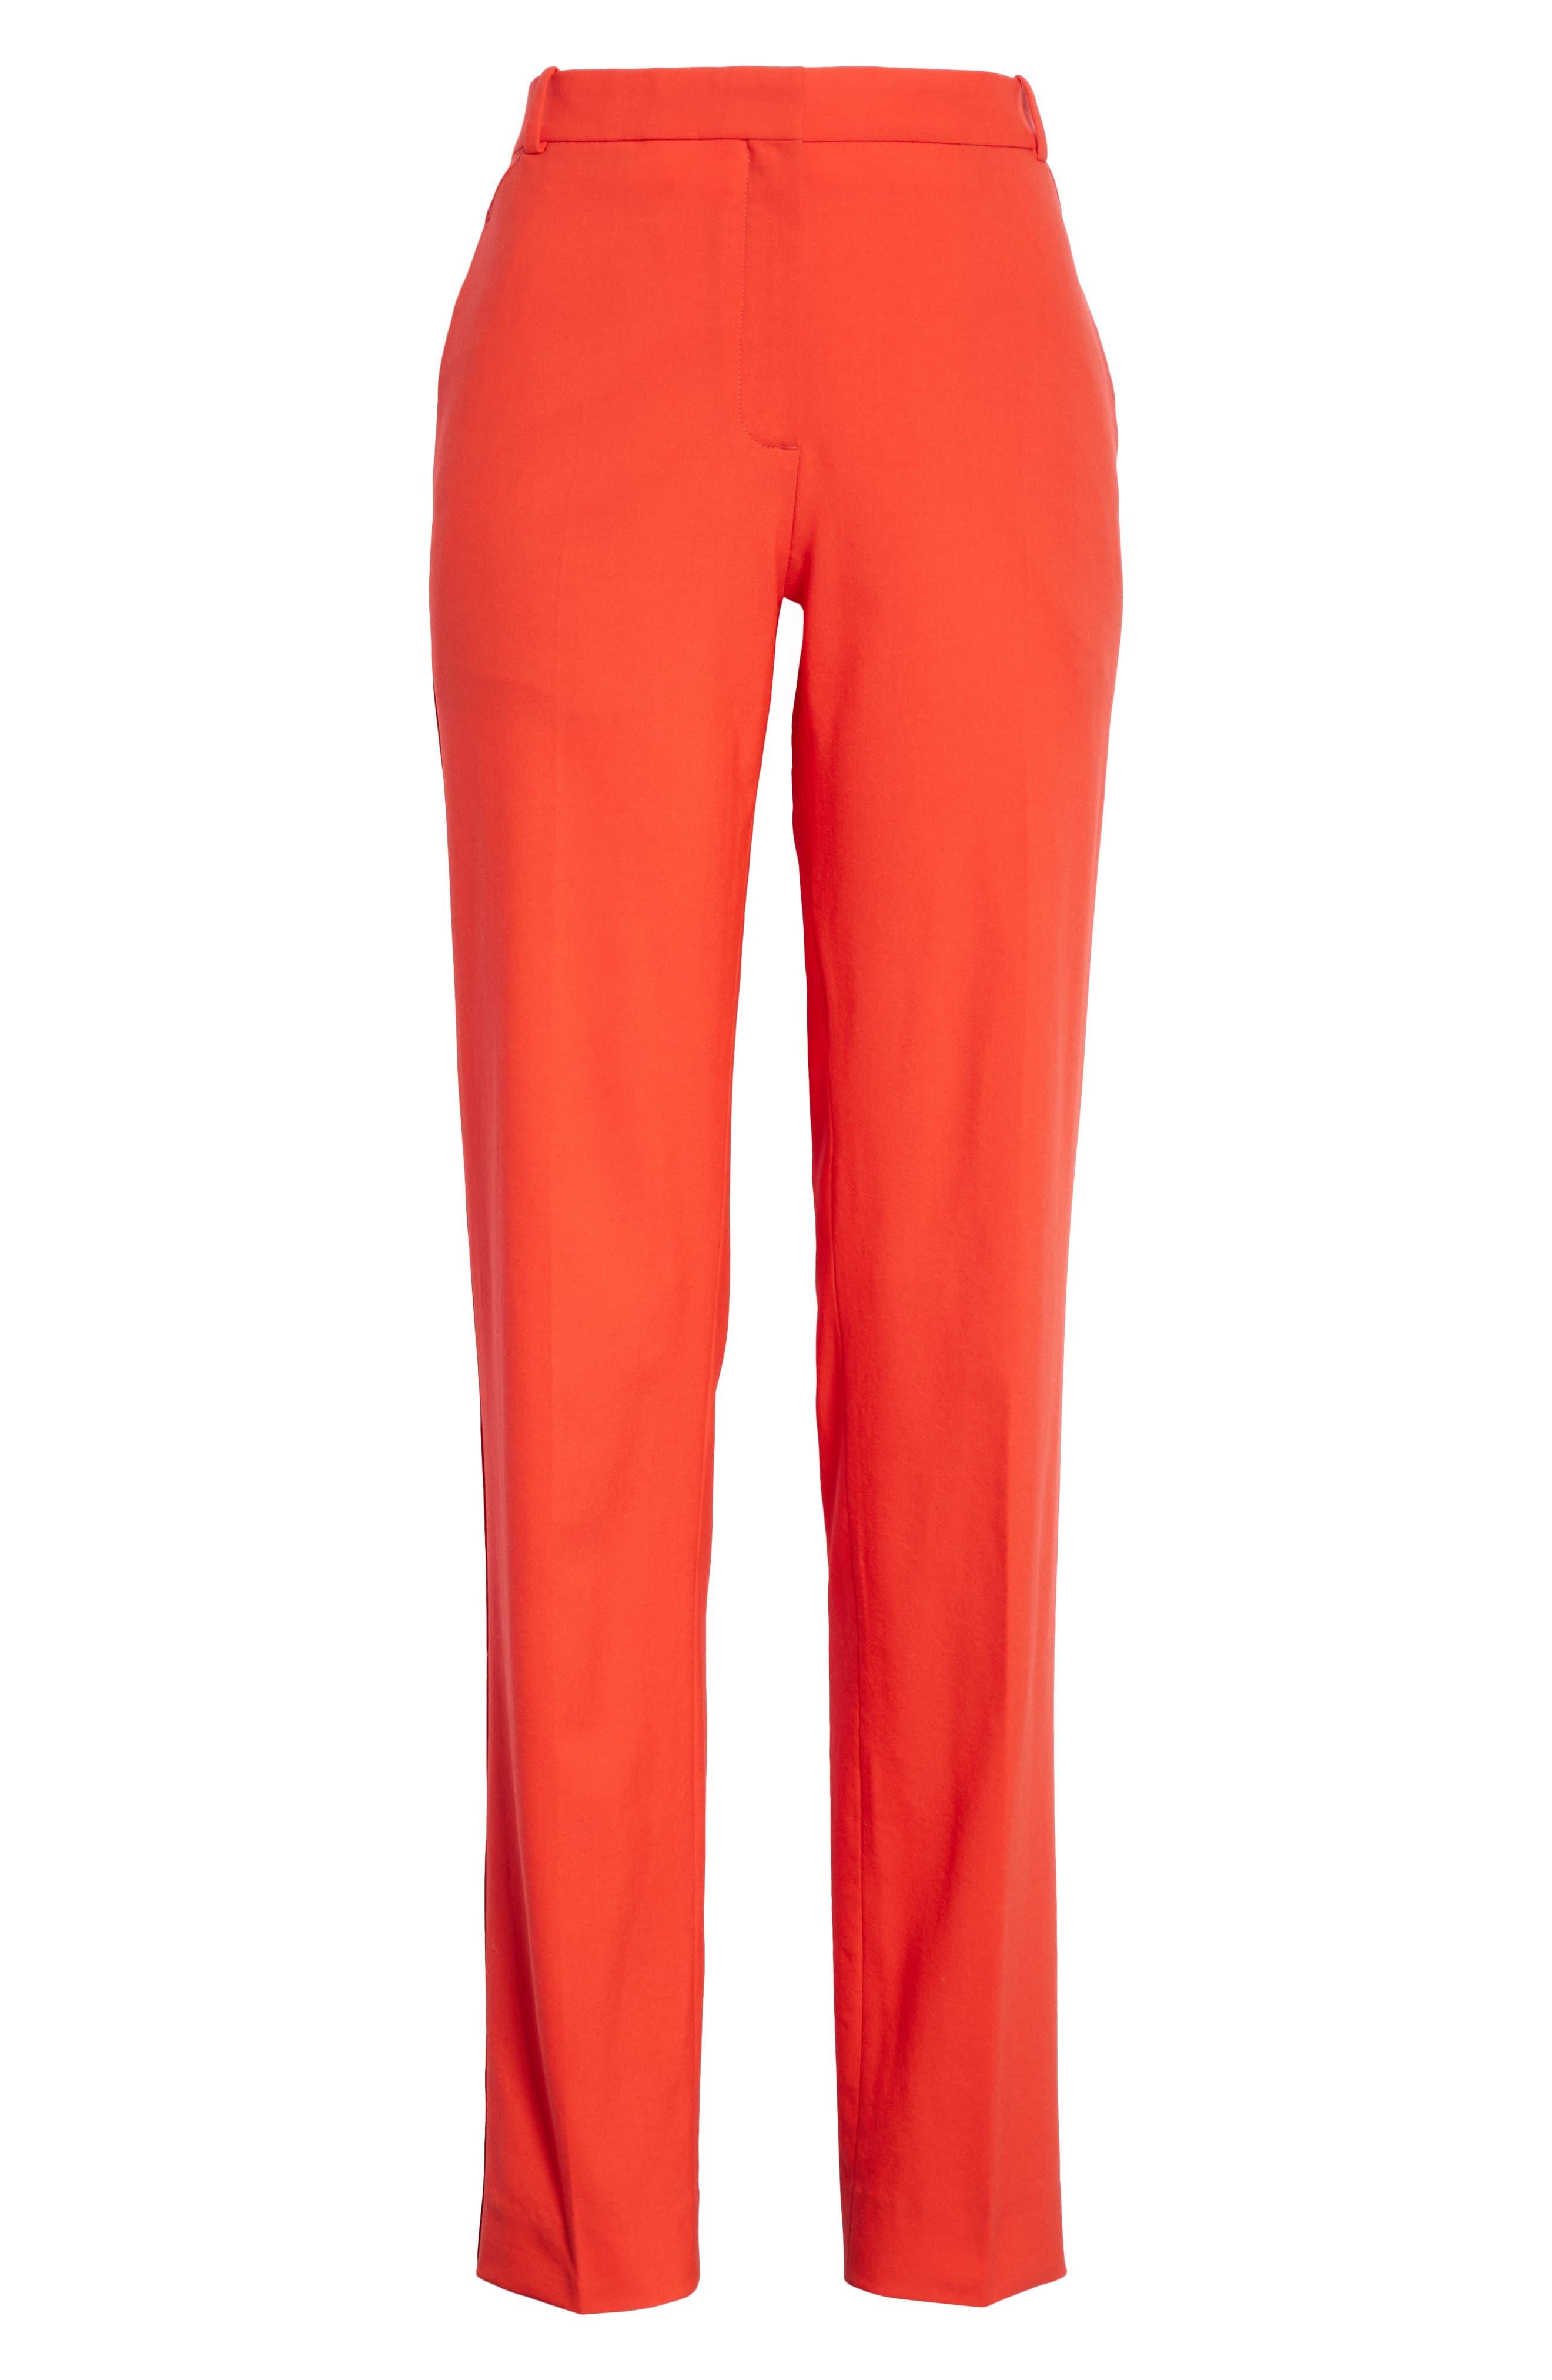 Oman Side Stripe Wool Blend Pants,                             Alternate thumbnail 7, color,                             Red